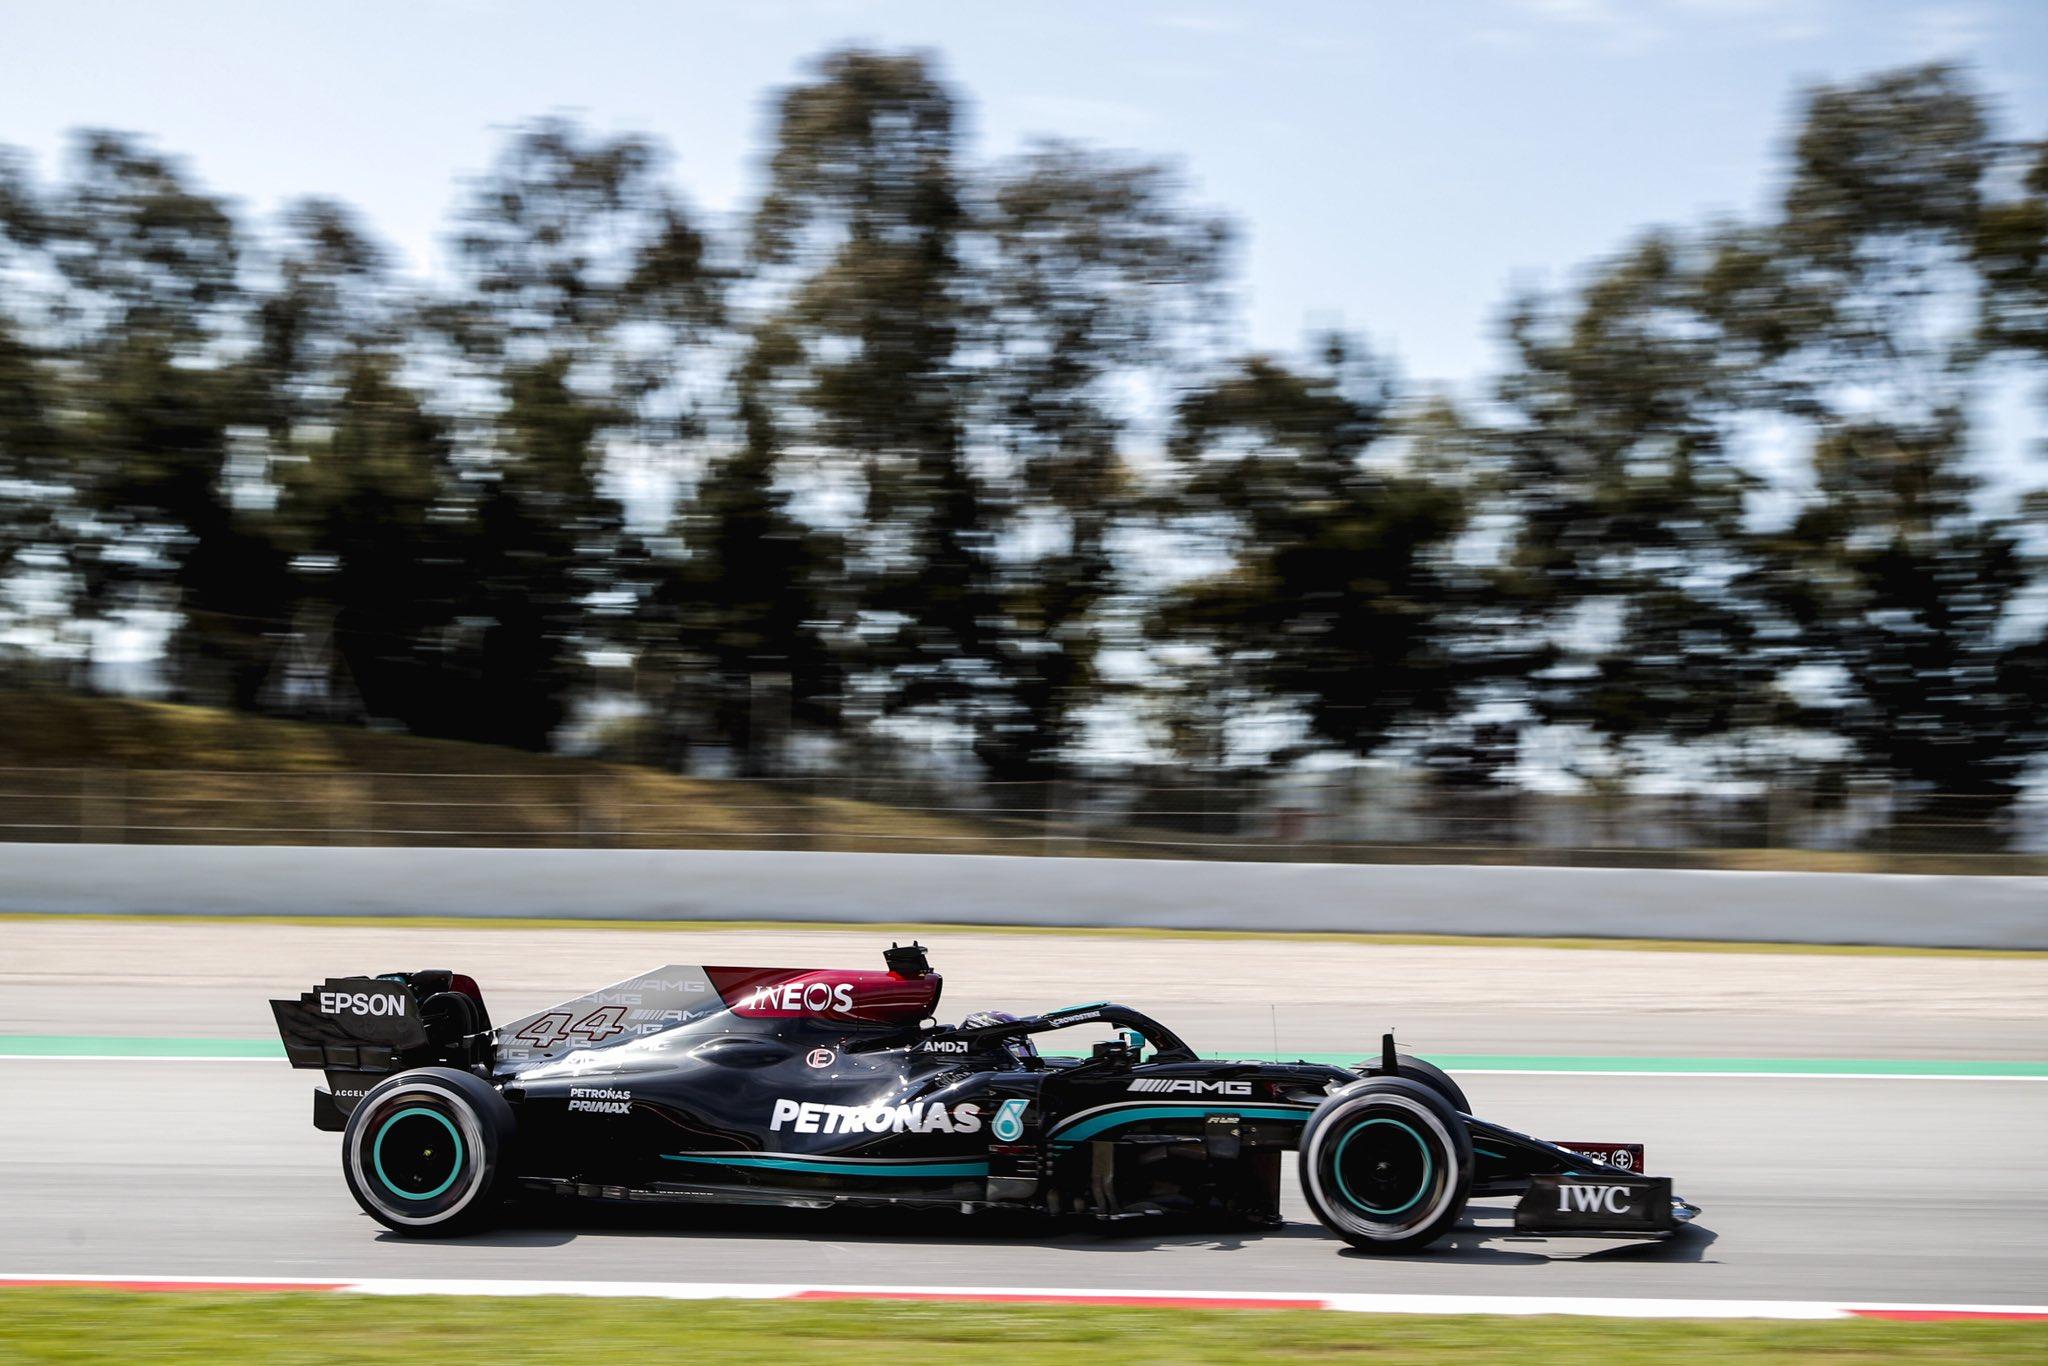 F1, Spanish GP, Lewis Hamilton